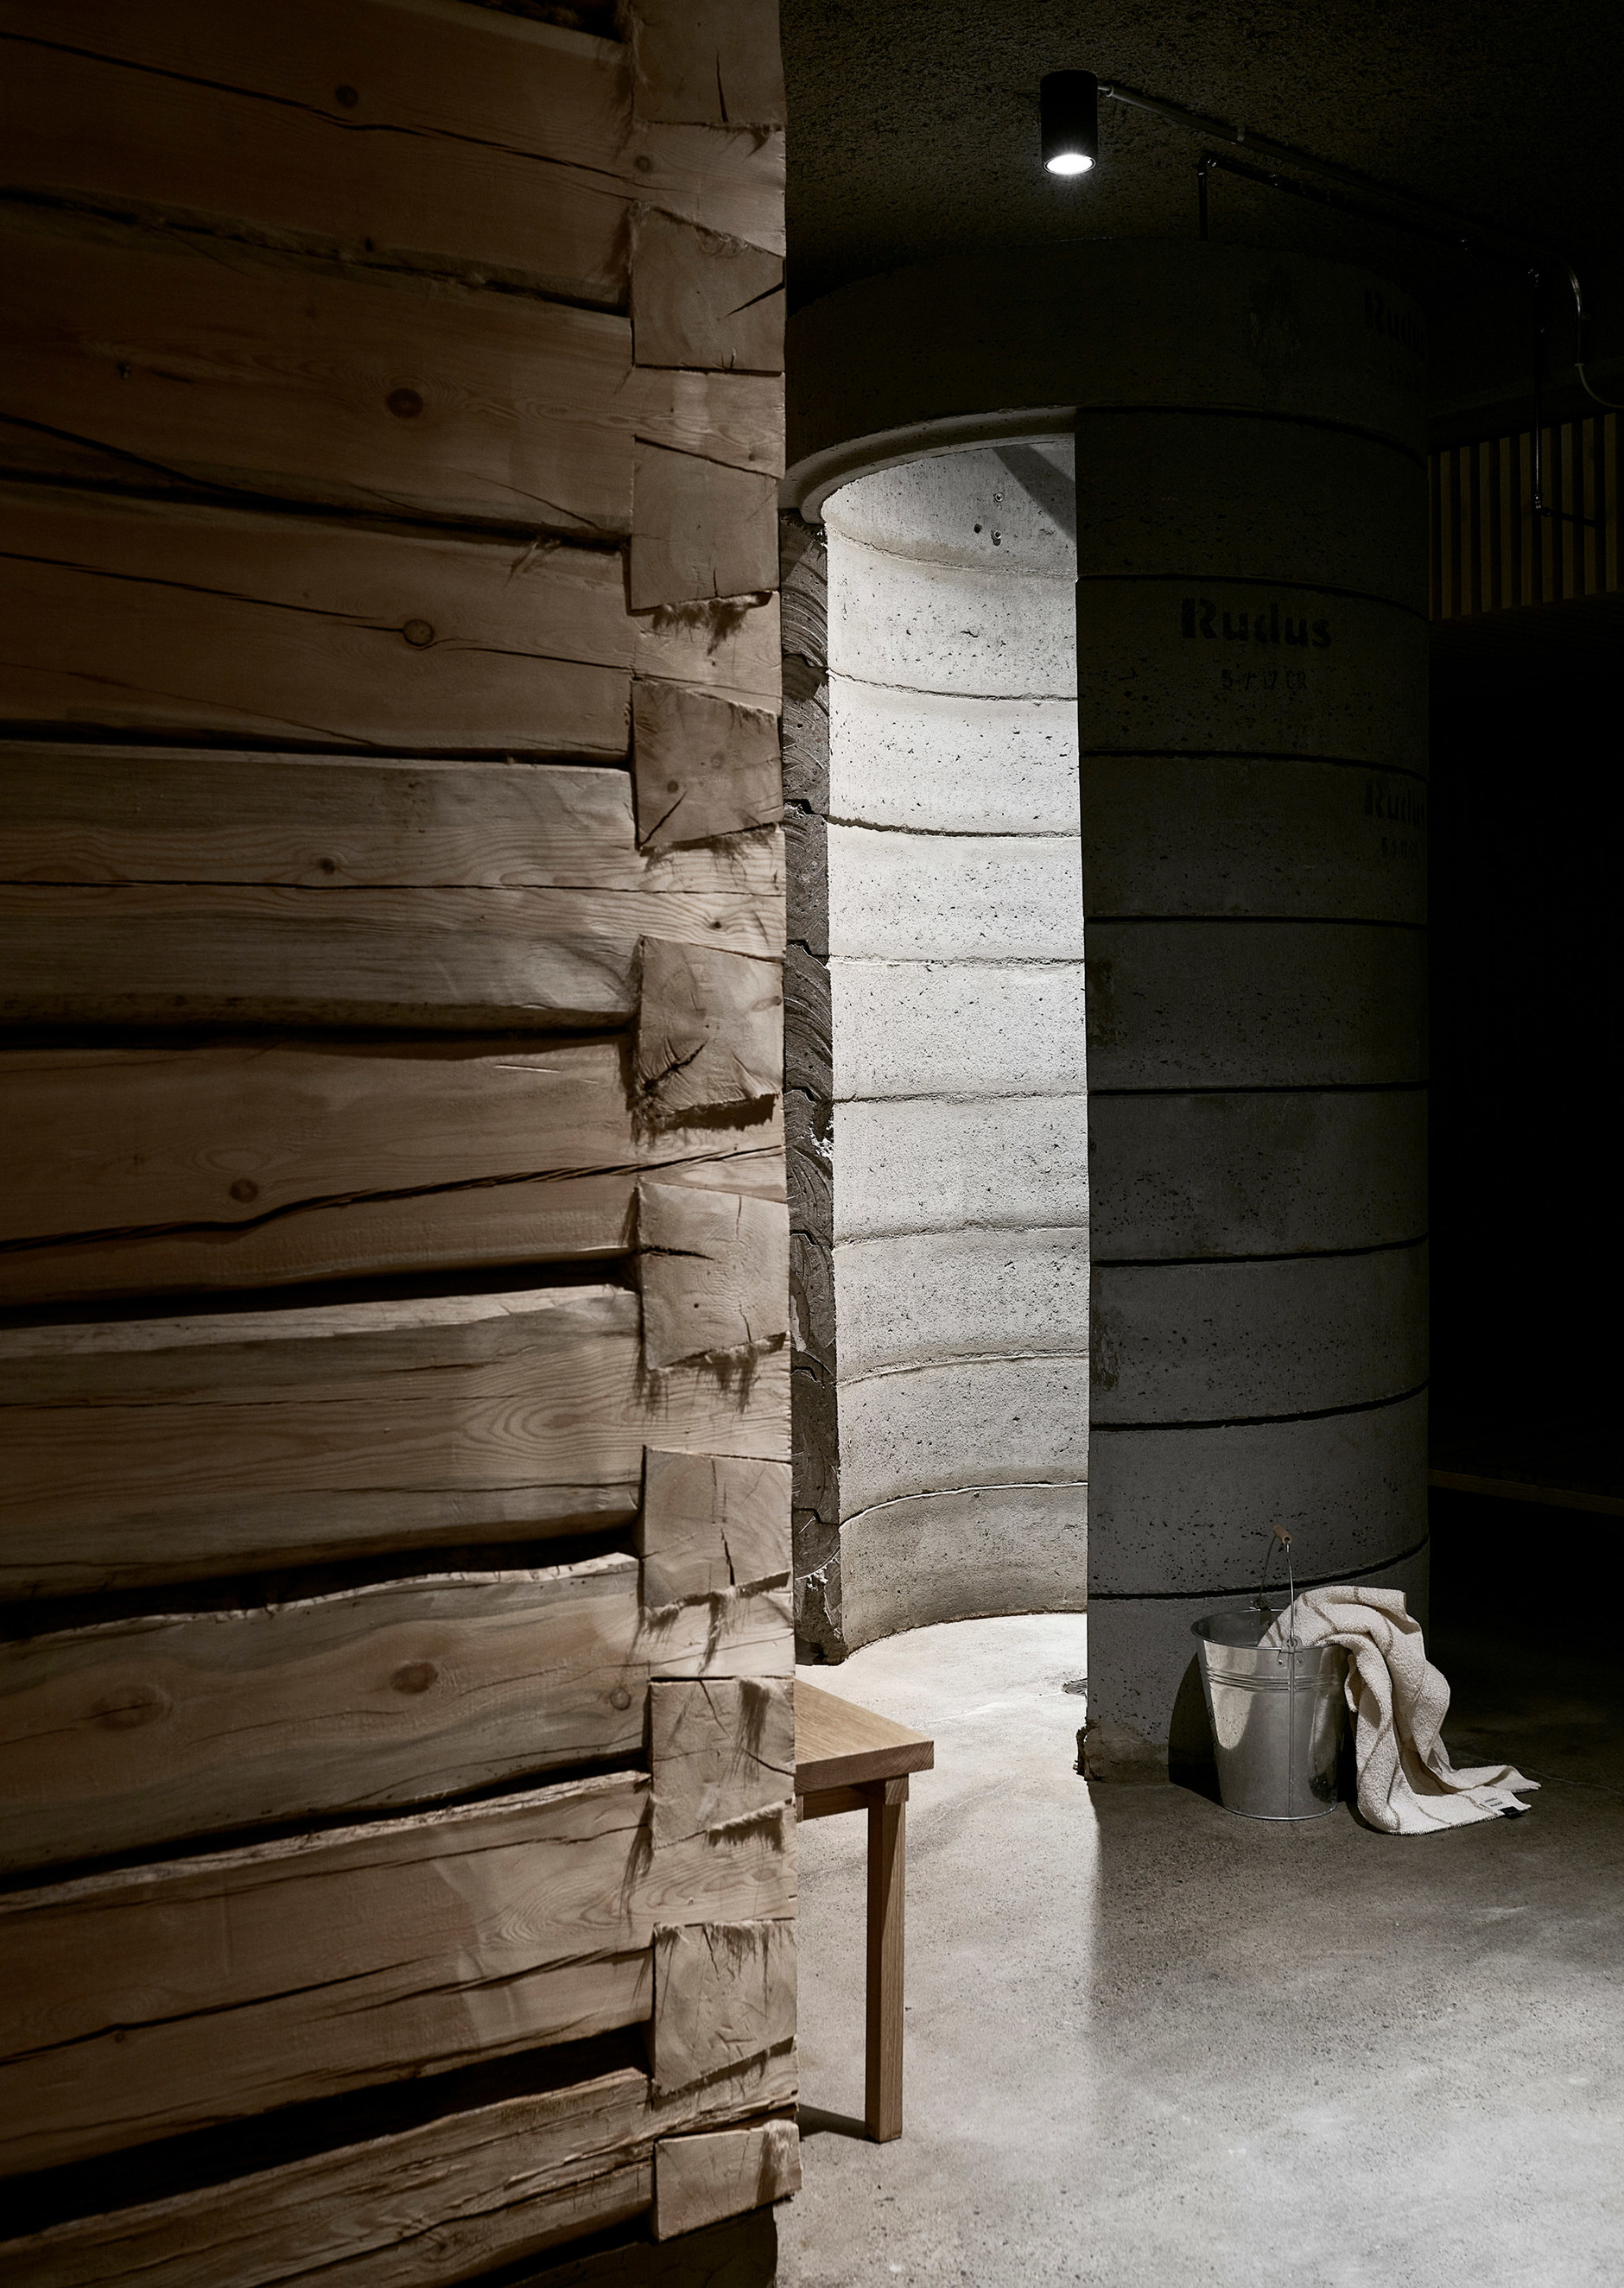 Дуб, бетон и скандинавский дизайн: сауна по проекту Studio Puisto (галерея 4, фото 1)